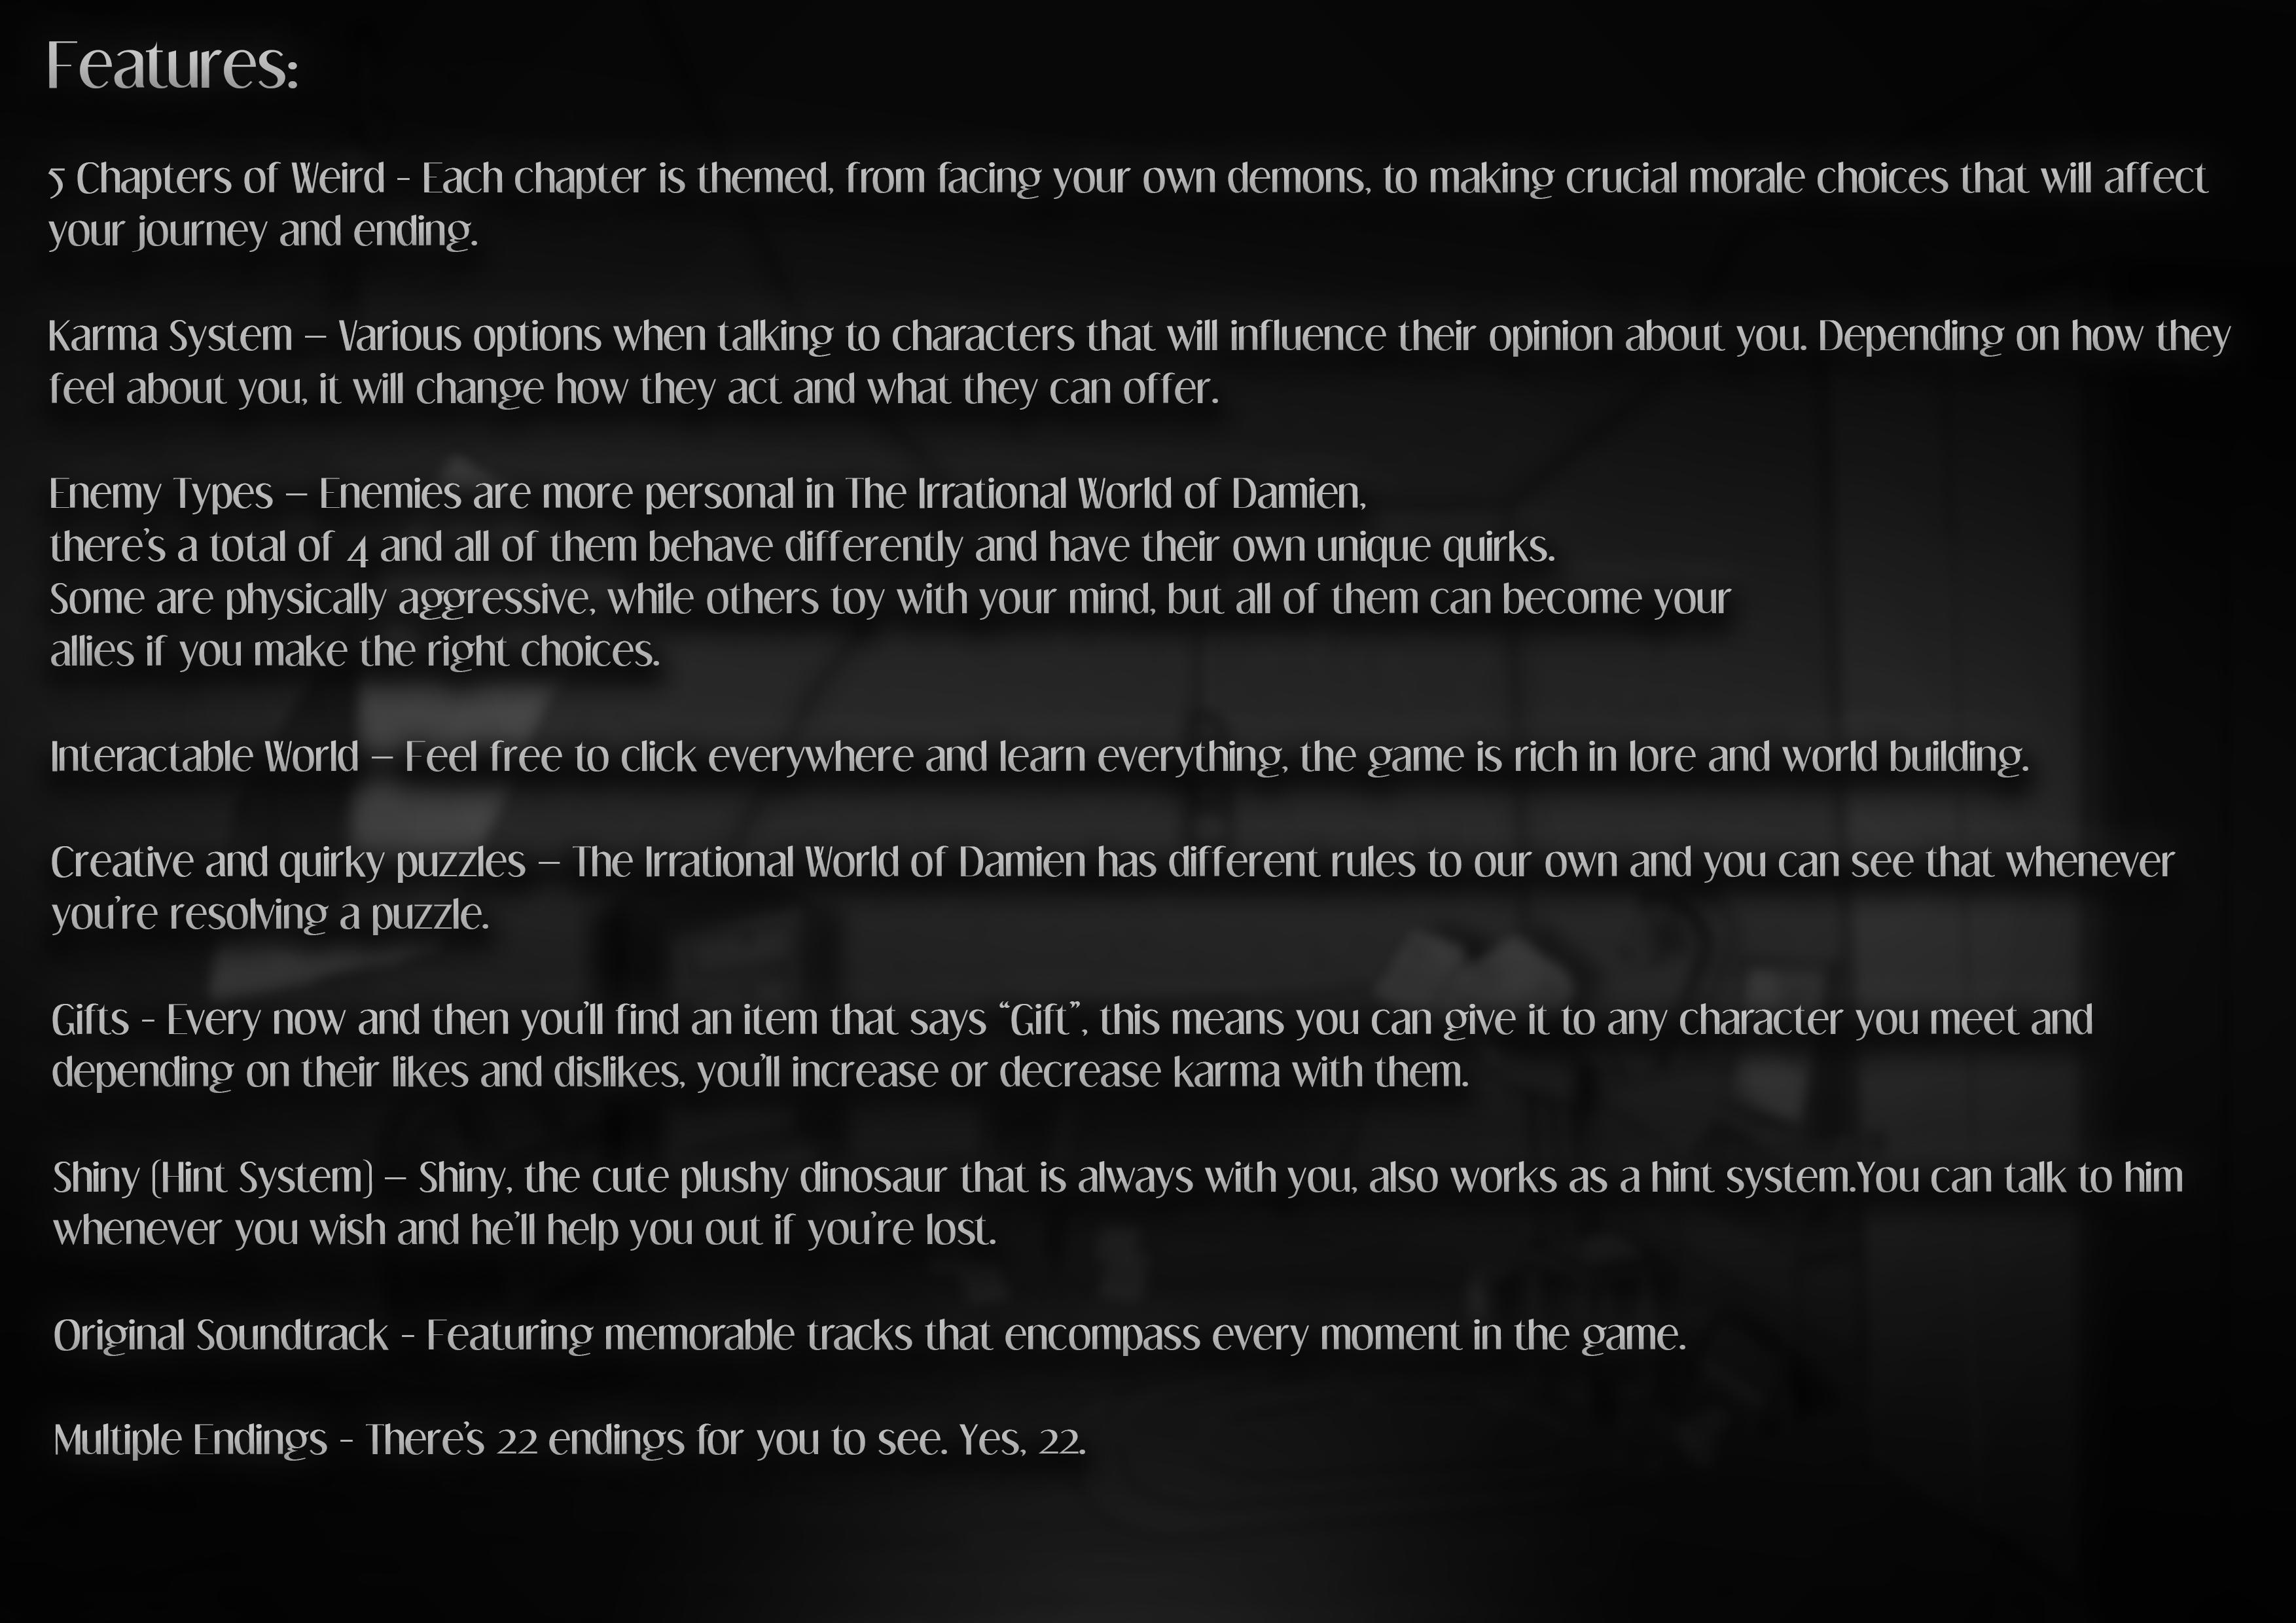 Scenario 2 Text Features